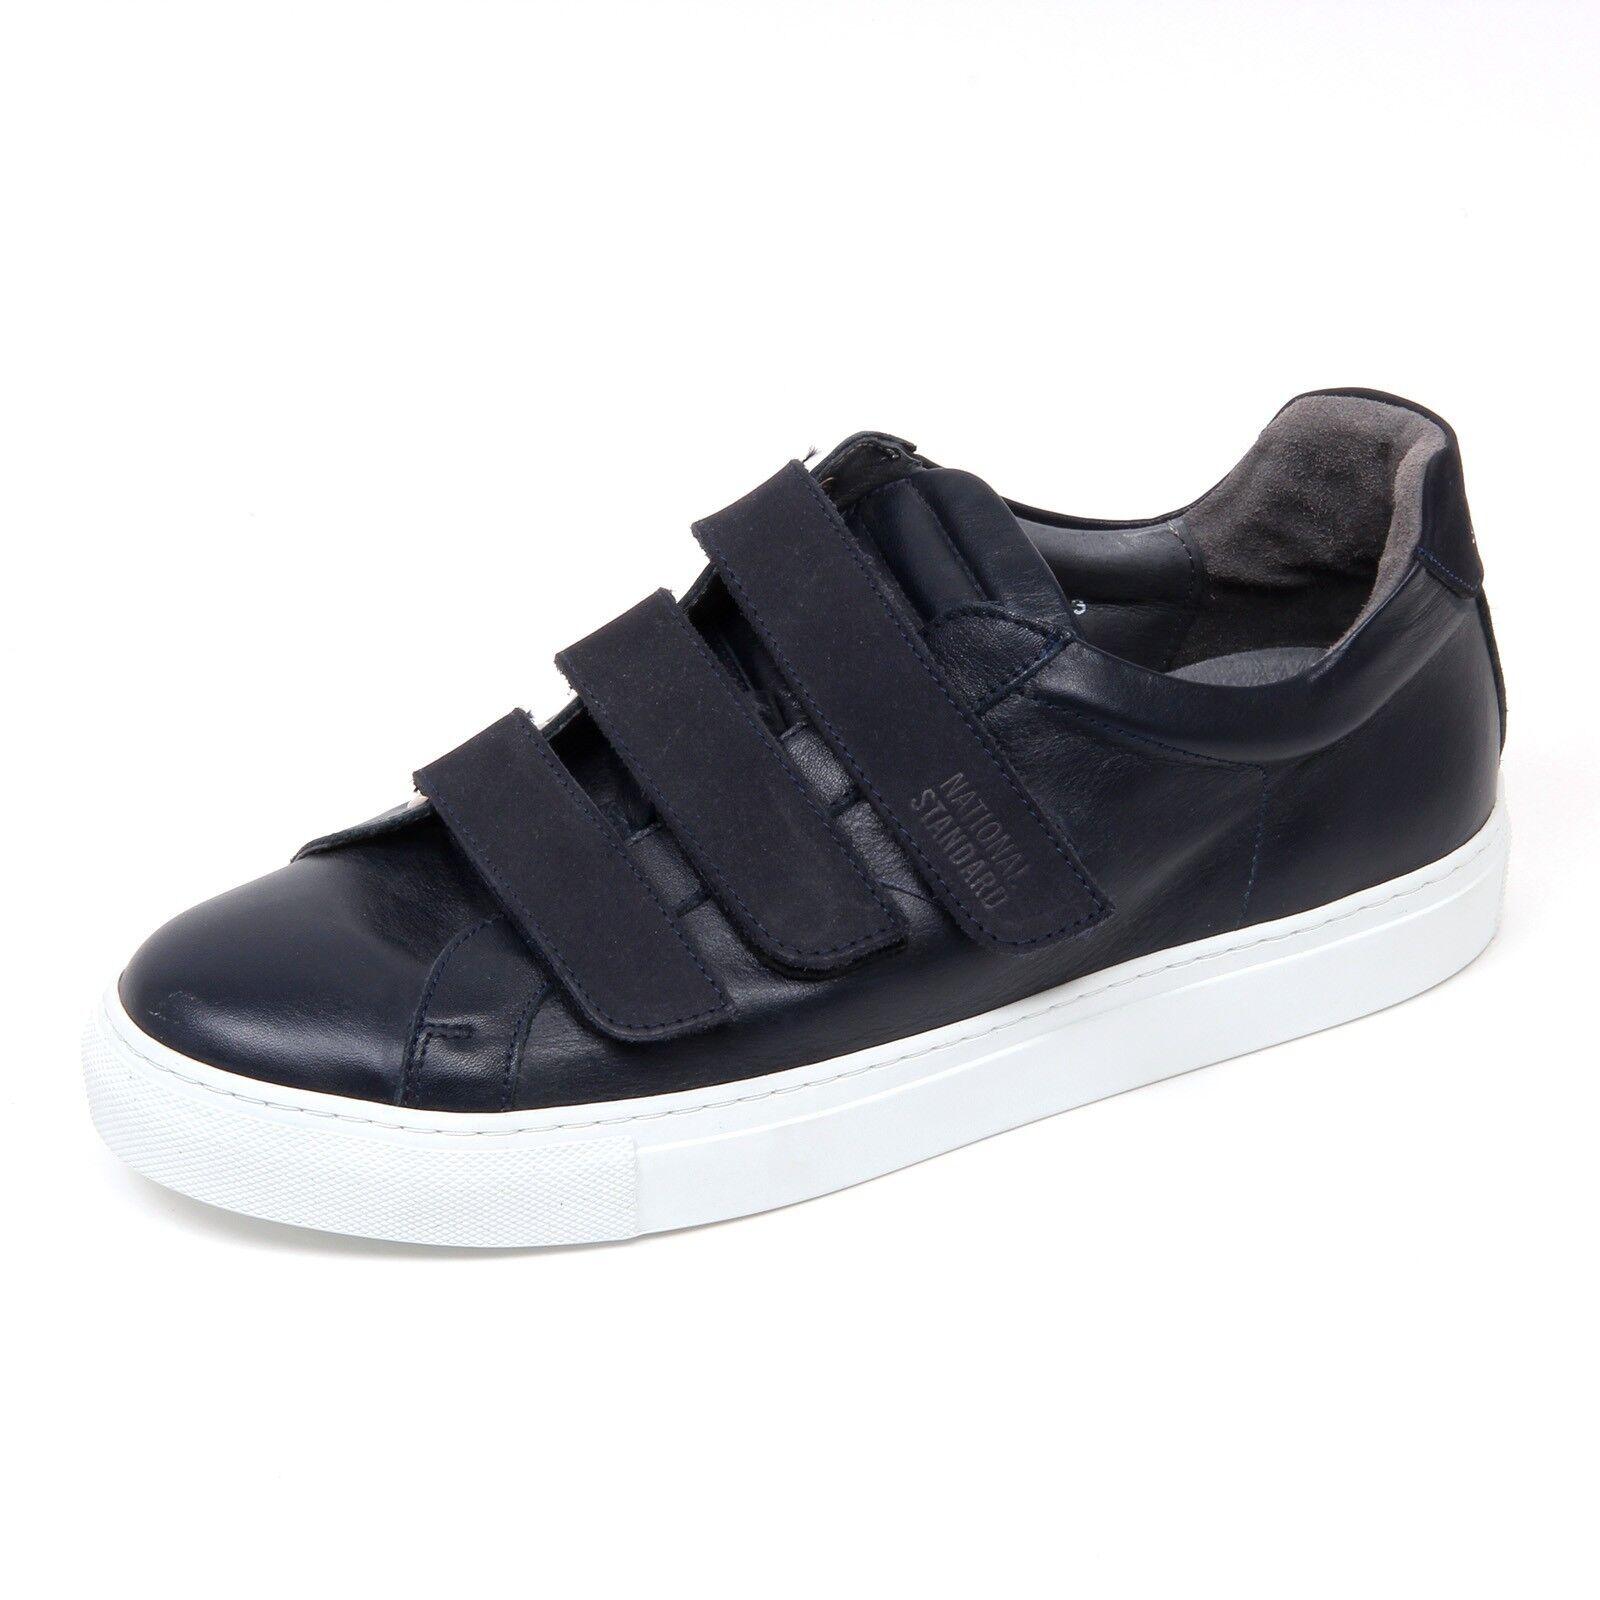 D0172 sneaker uomo NATIONAL STANDARD STANDARD STANDARD scarpa blu strappi shoe man 9cfa99